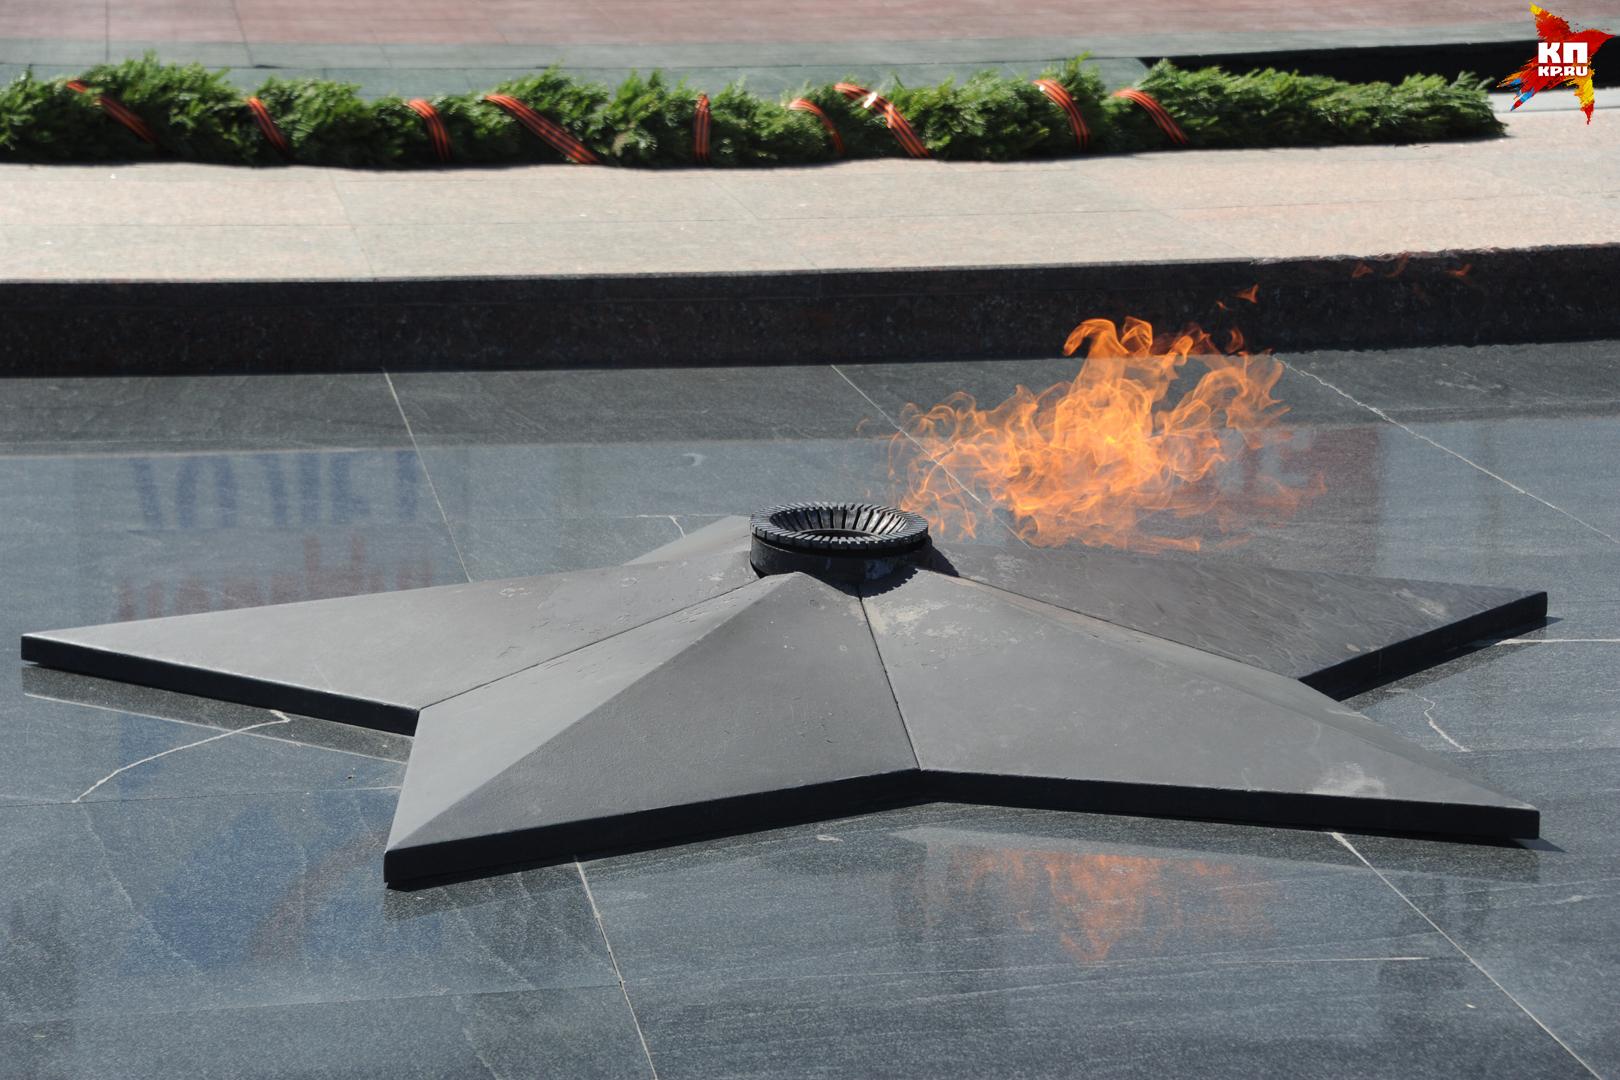 Гражданин Брянской области сварил ведро супа на извечном огне